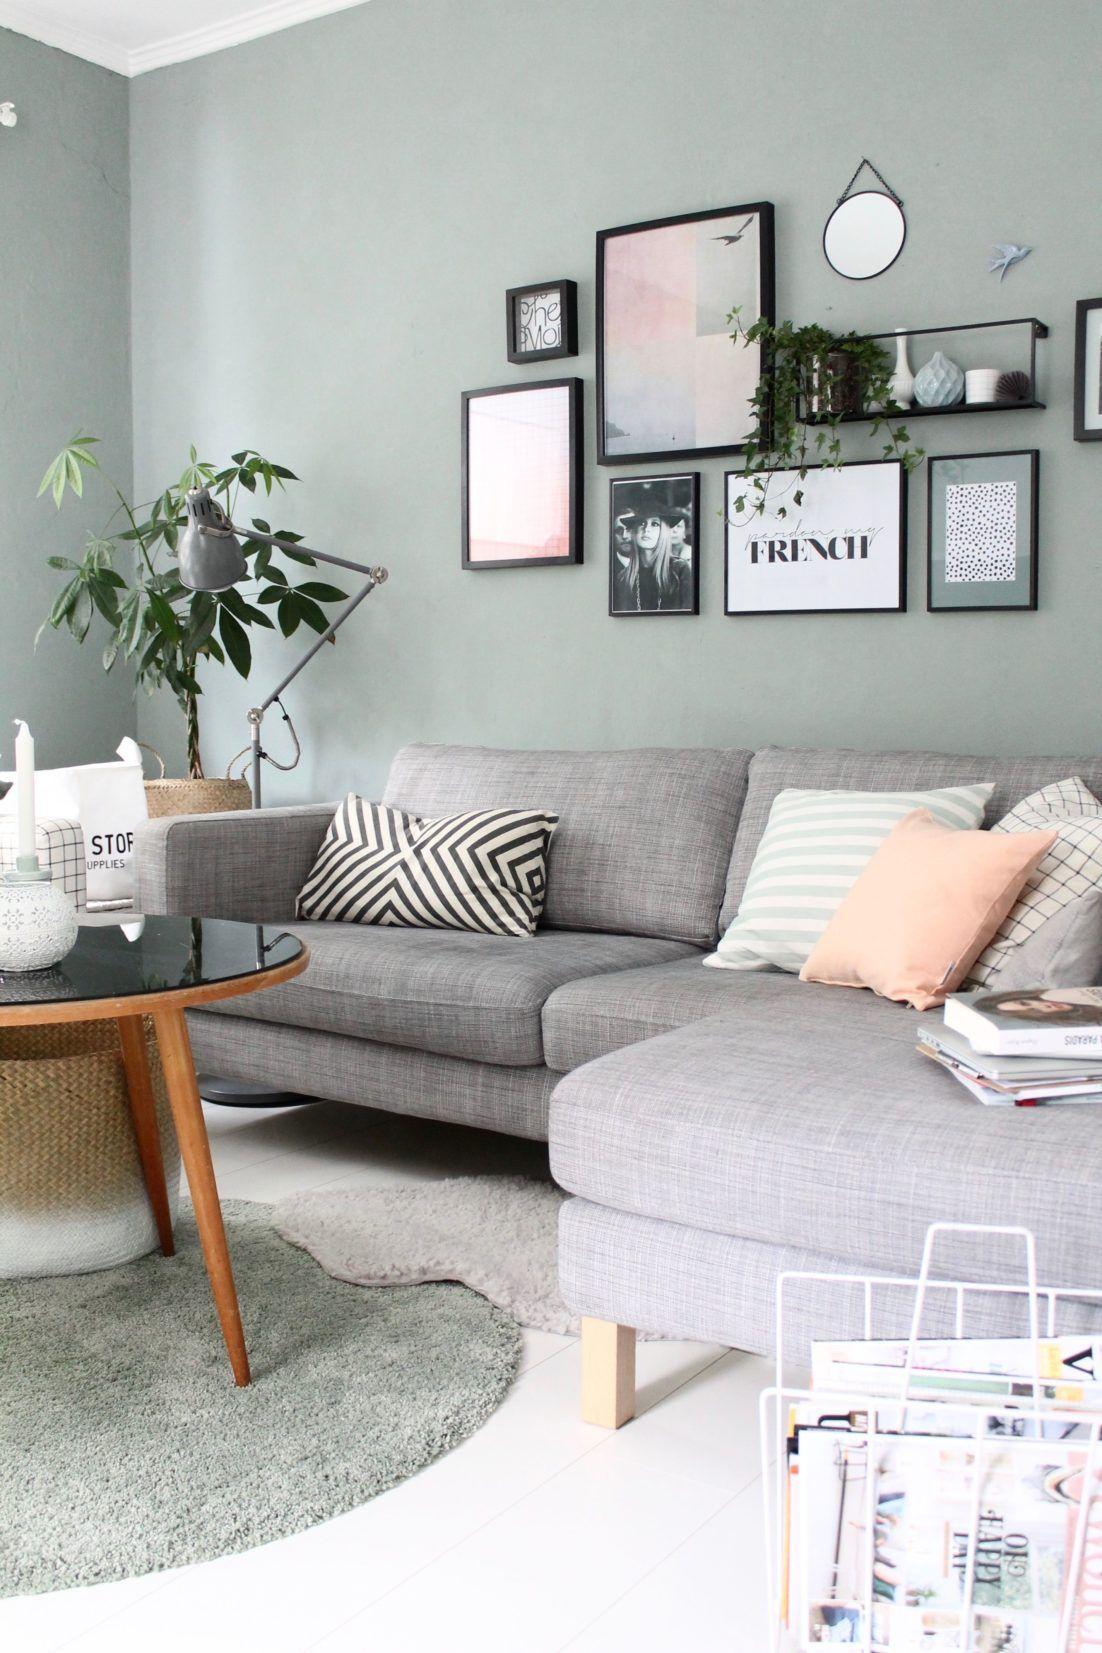 Wandfarbe Wohnzimmer Blau Grau Wandfarbe Wohnzimmer Graue Couch Trendige Wandfarben Wohnzimmer Wandfarben Fürs Wohnzimmer I Wandfarbe Wohnzimmer Wohnen Wohnung